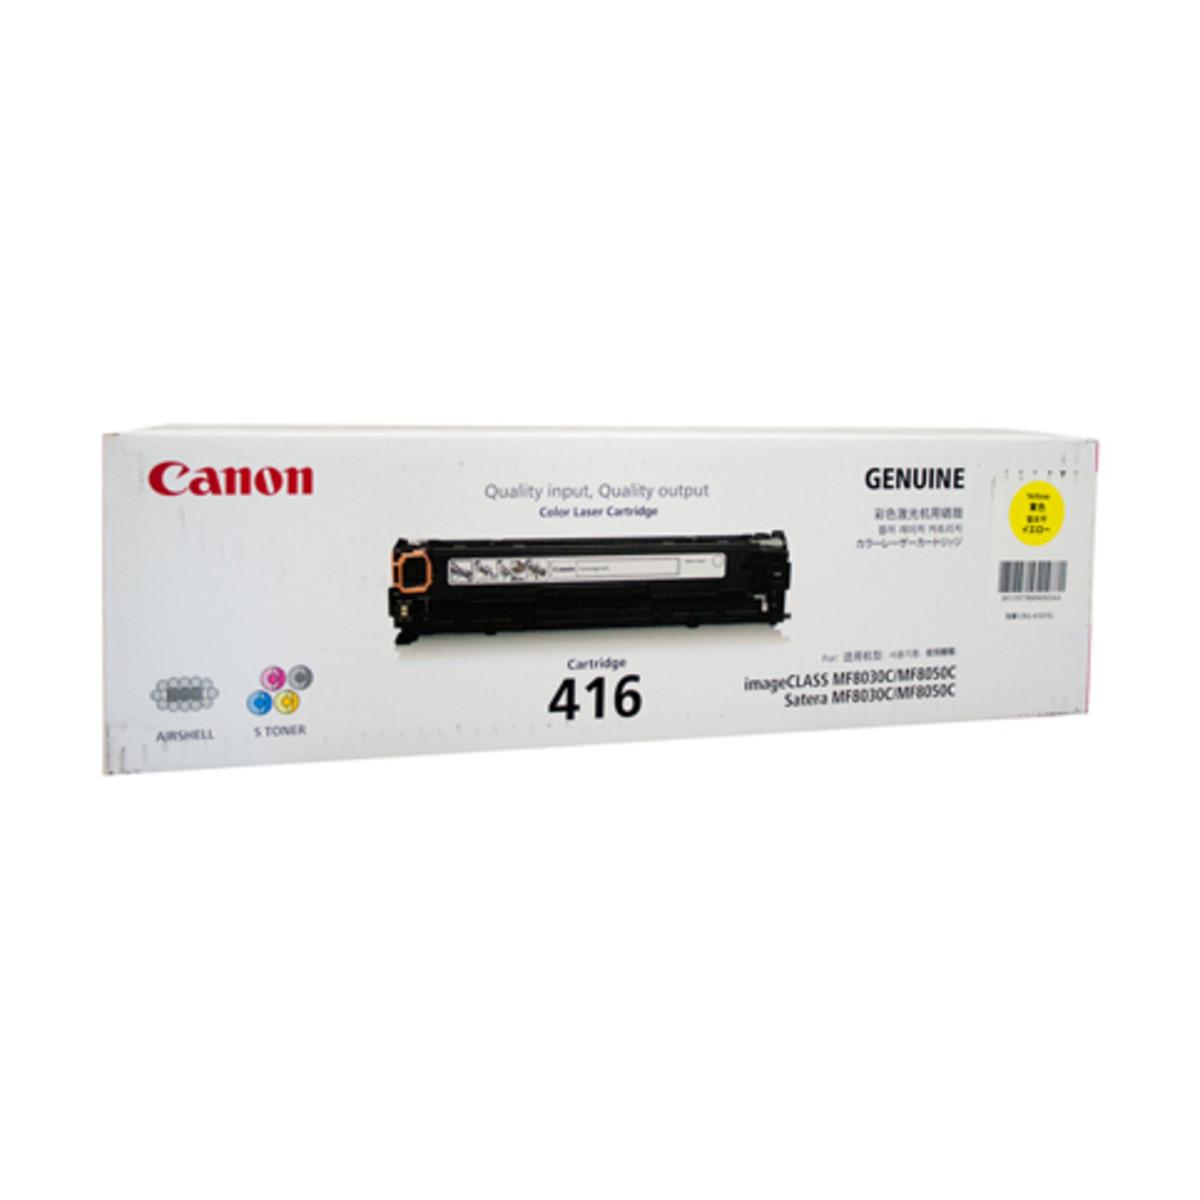 Canon CART-416Y Yellow Toner Cartridge